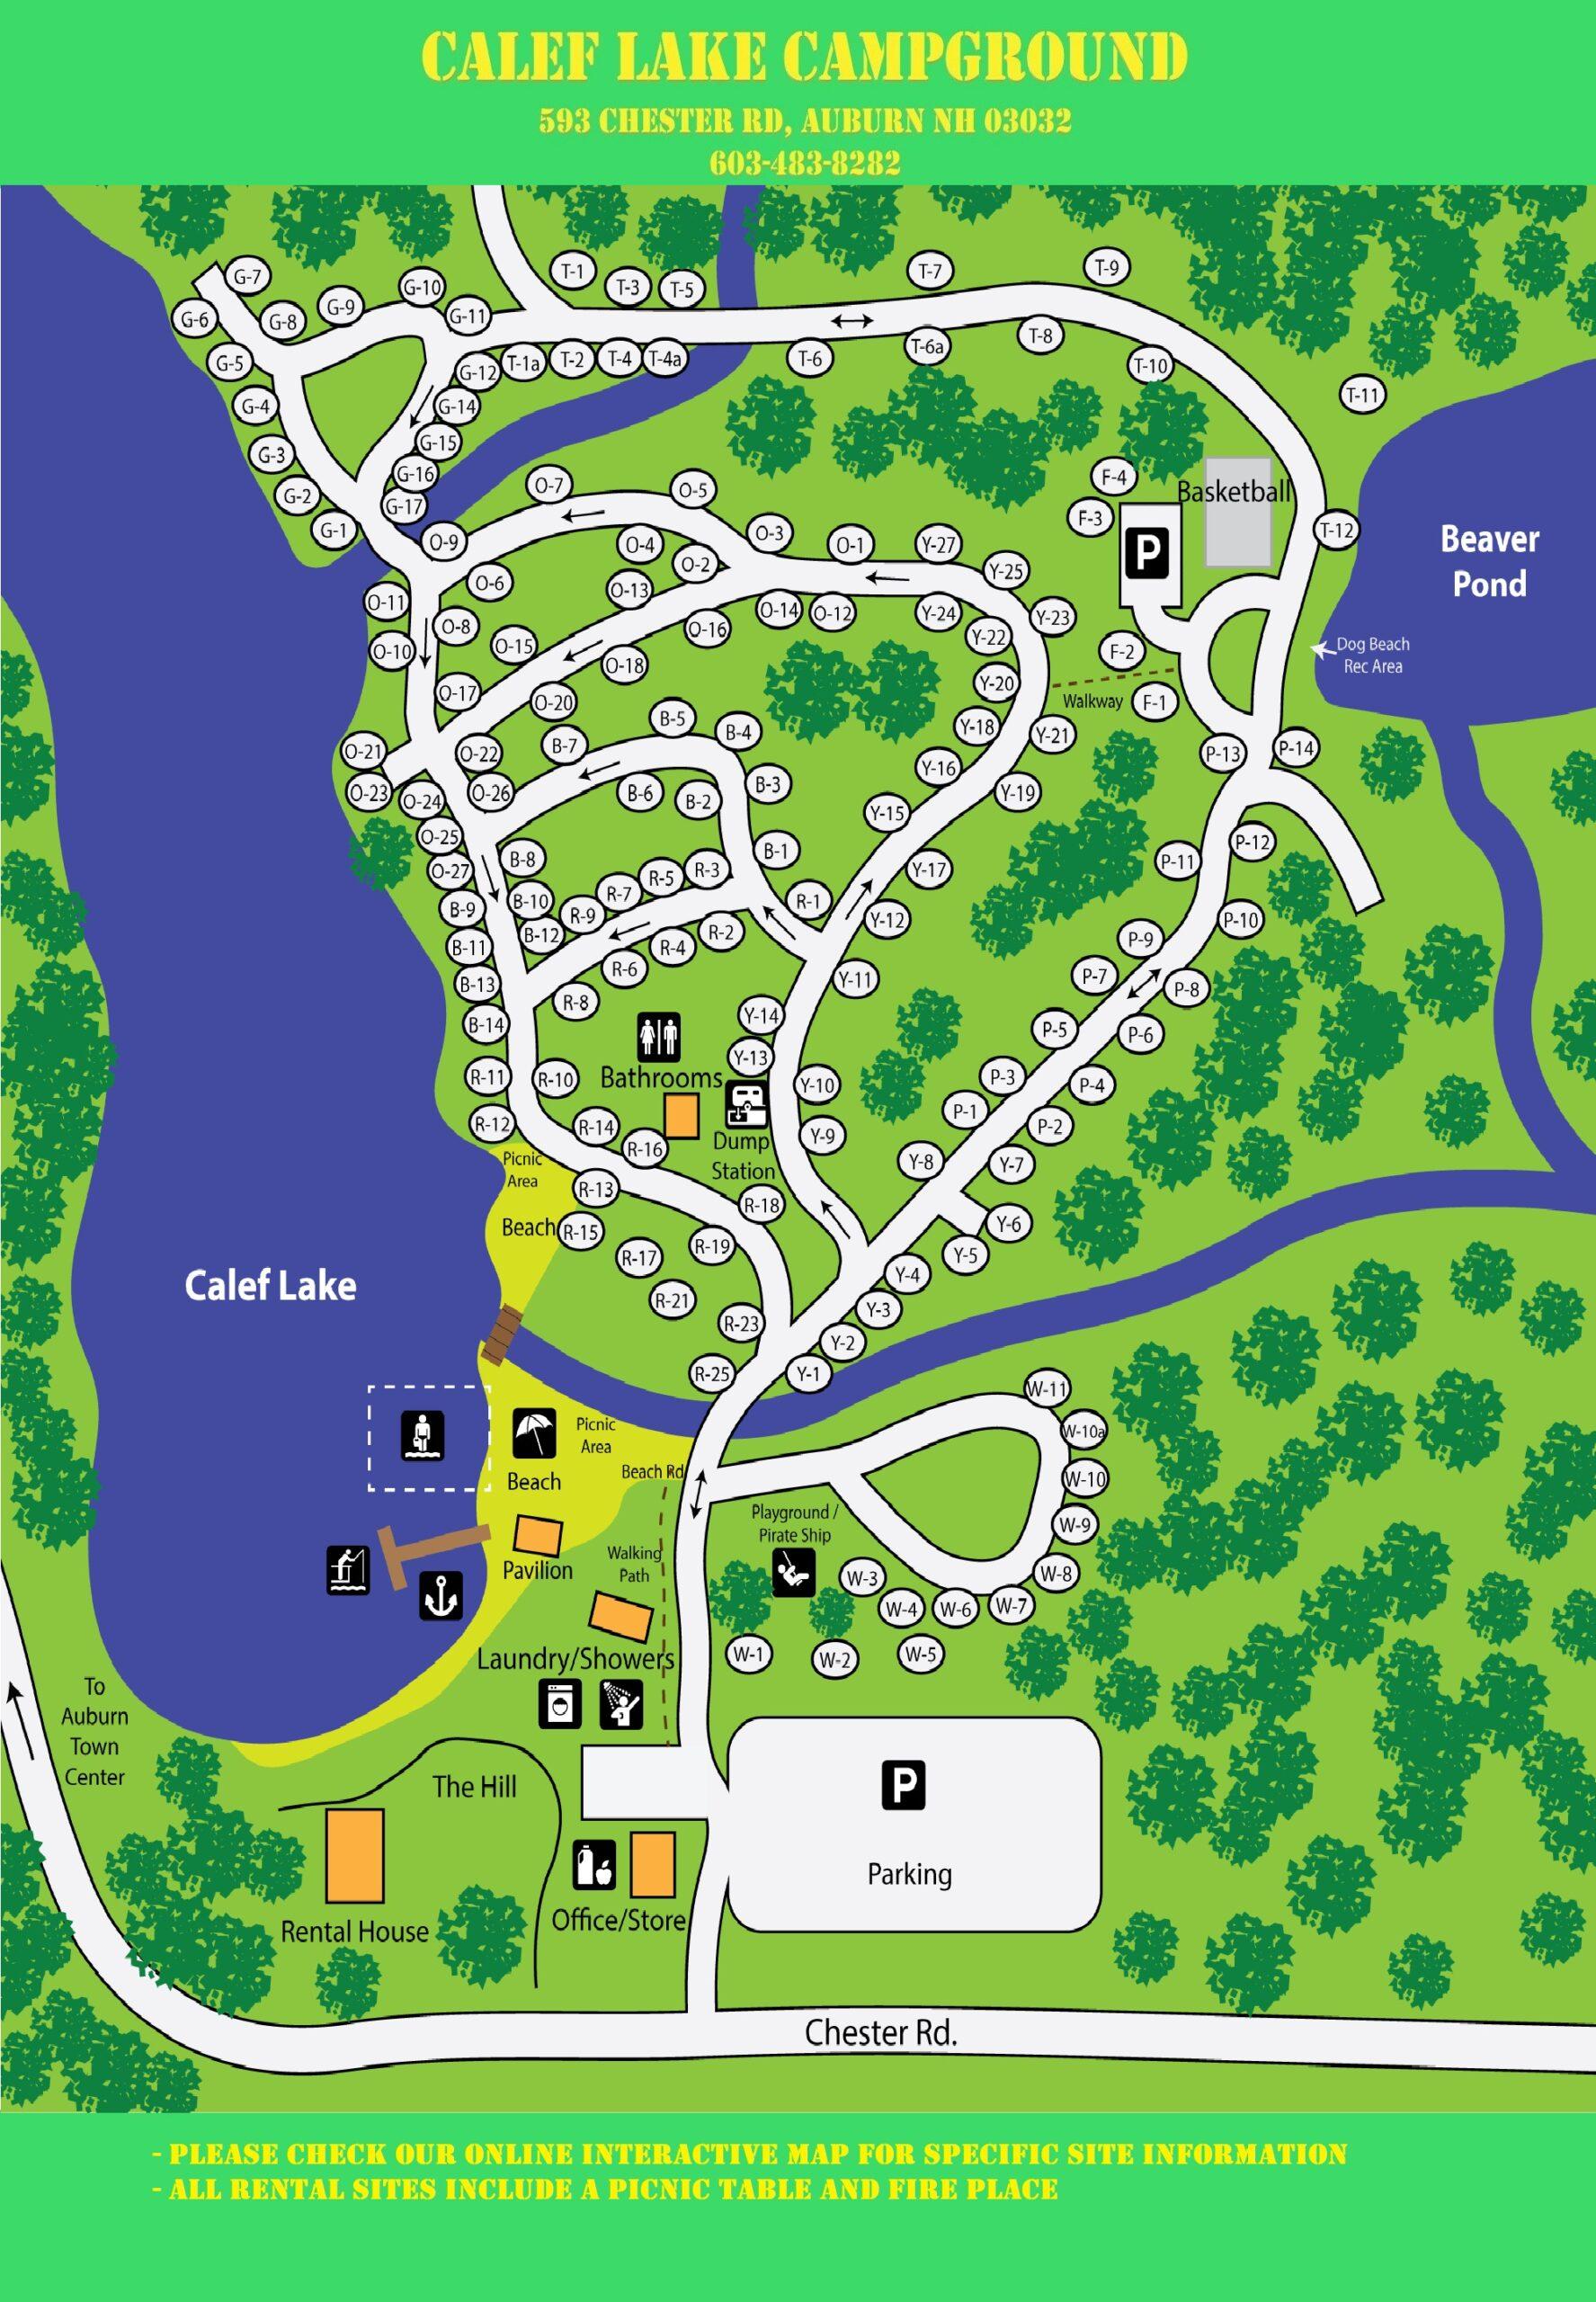 Calef Lake Campground Map